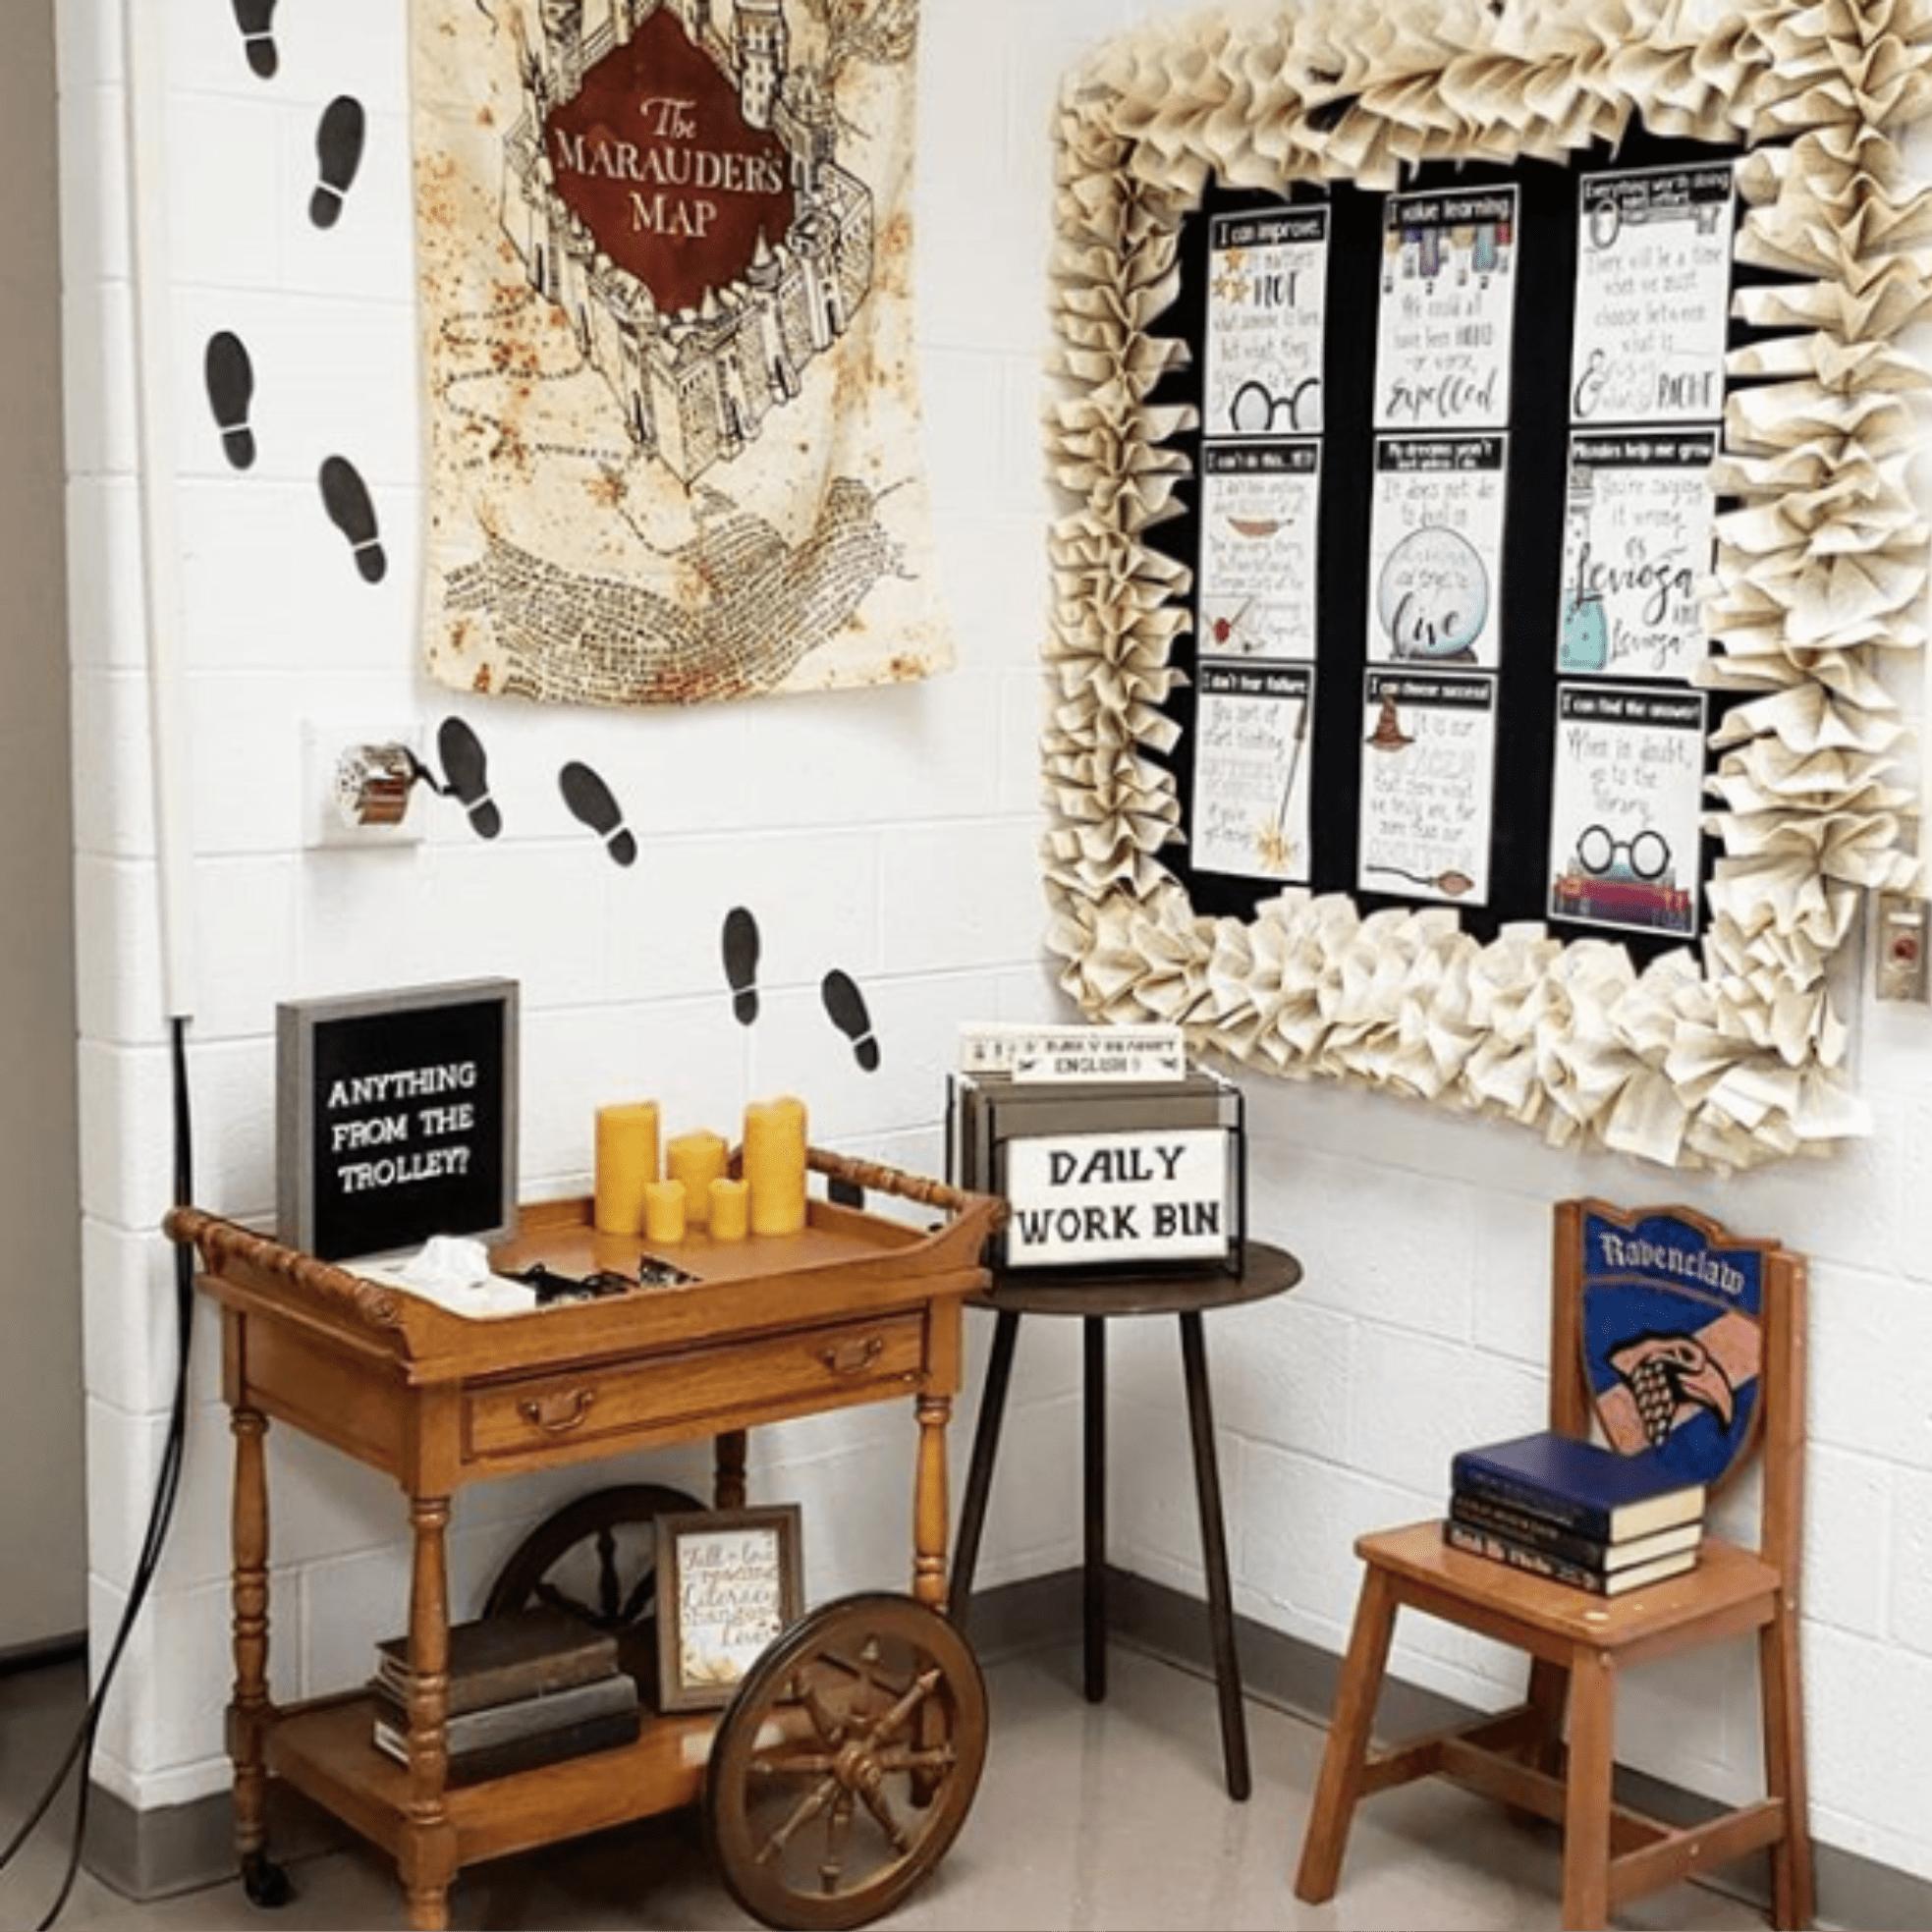 High School Teacher Decorates Classroom Like Harry Potter